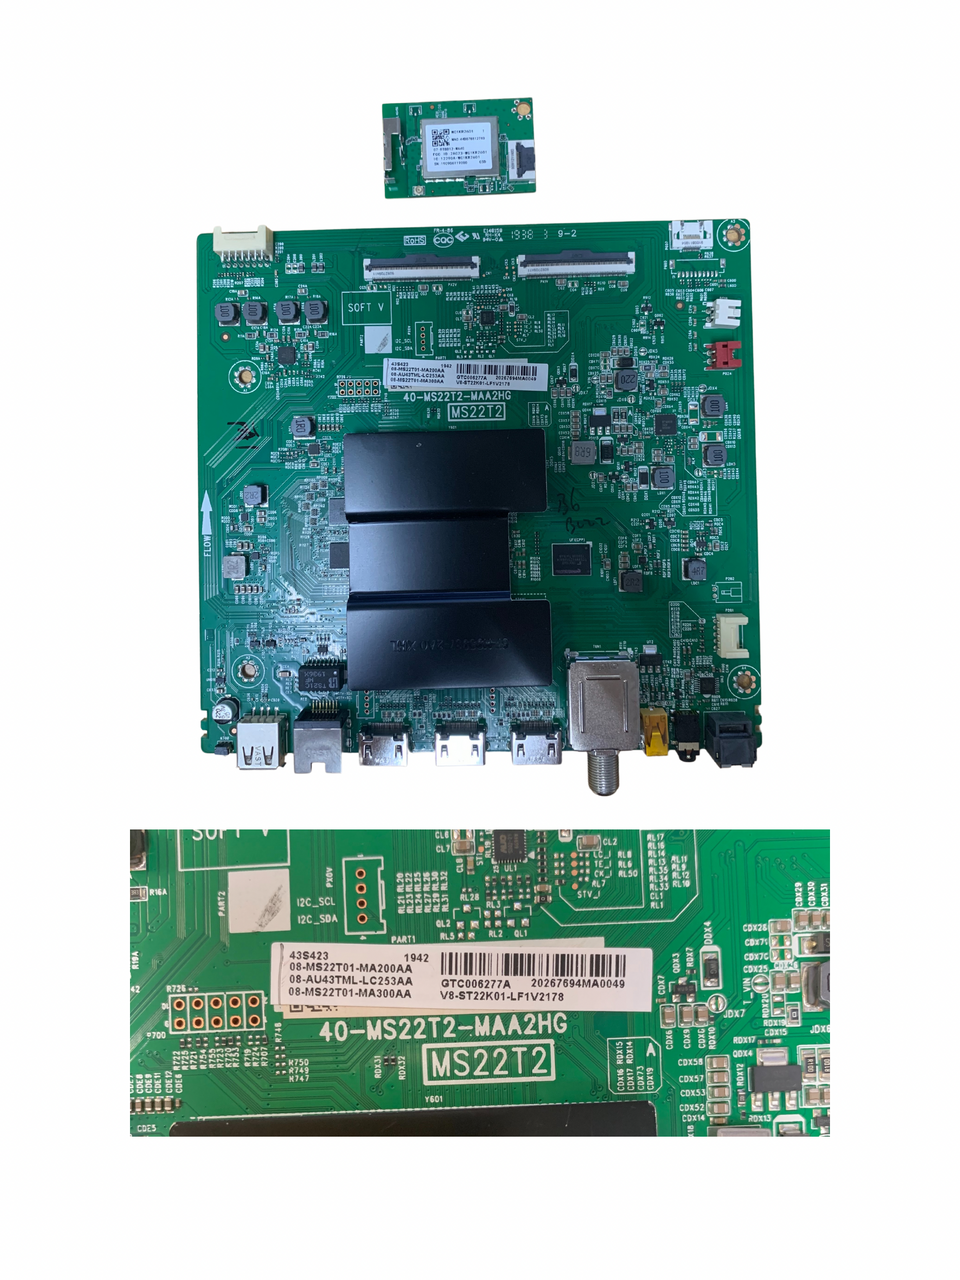 TCL 43S423 Main board & WIFI Module 40-MS22T2-MAA2HG / V8-ST22K01-LF1V2178 & 07-RT8812-MA4G